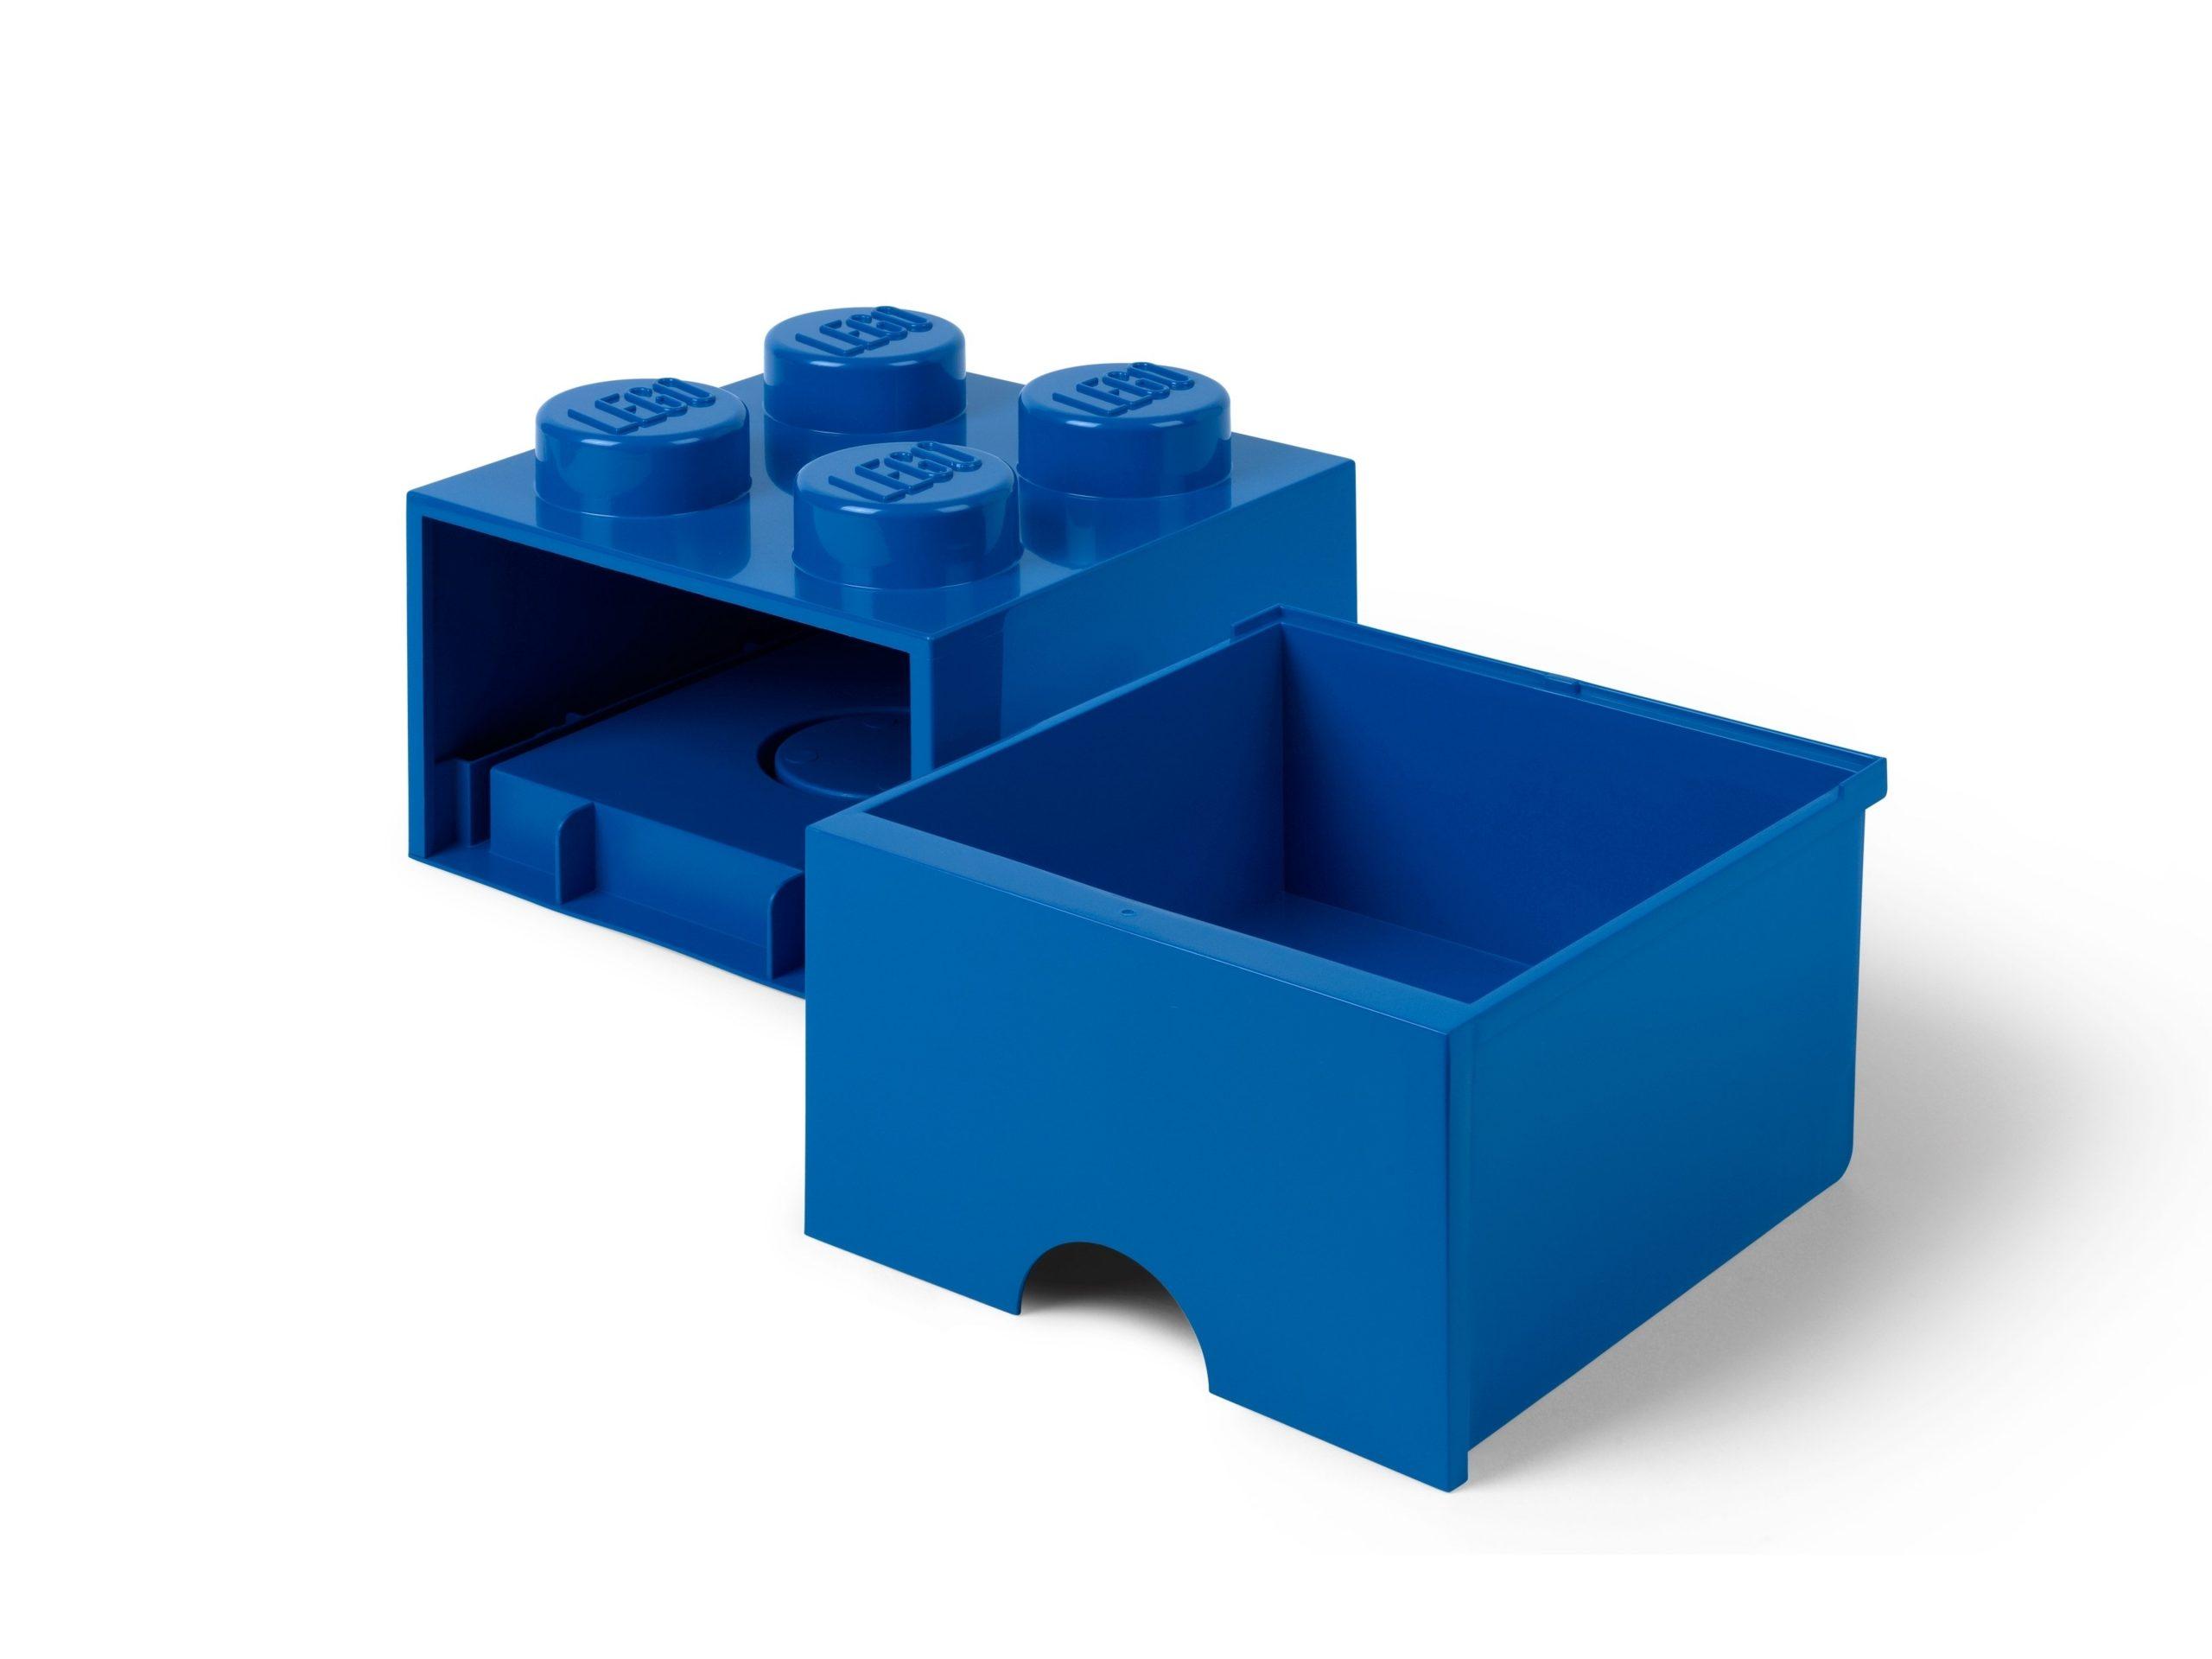 lego 5005403 4 stud bright blue storage brick drawer scaled